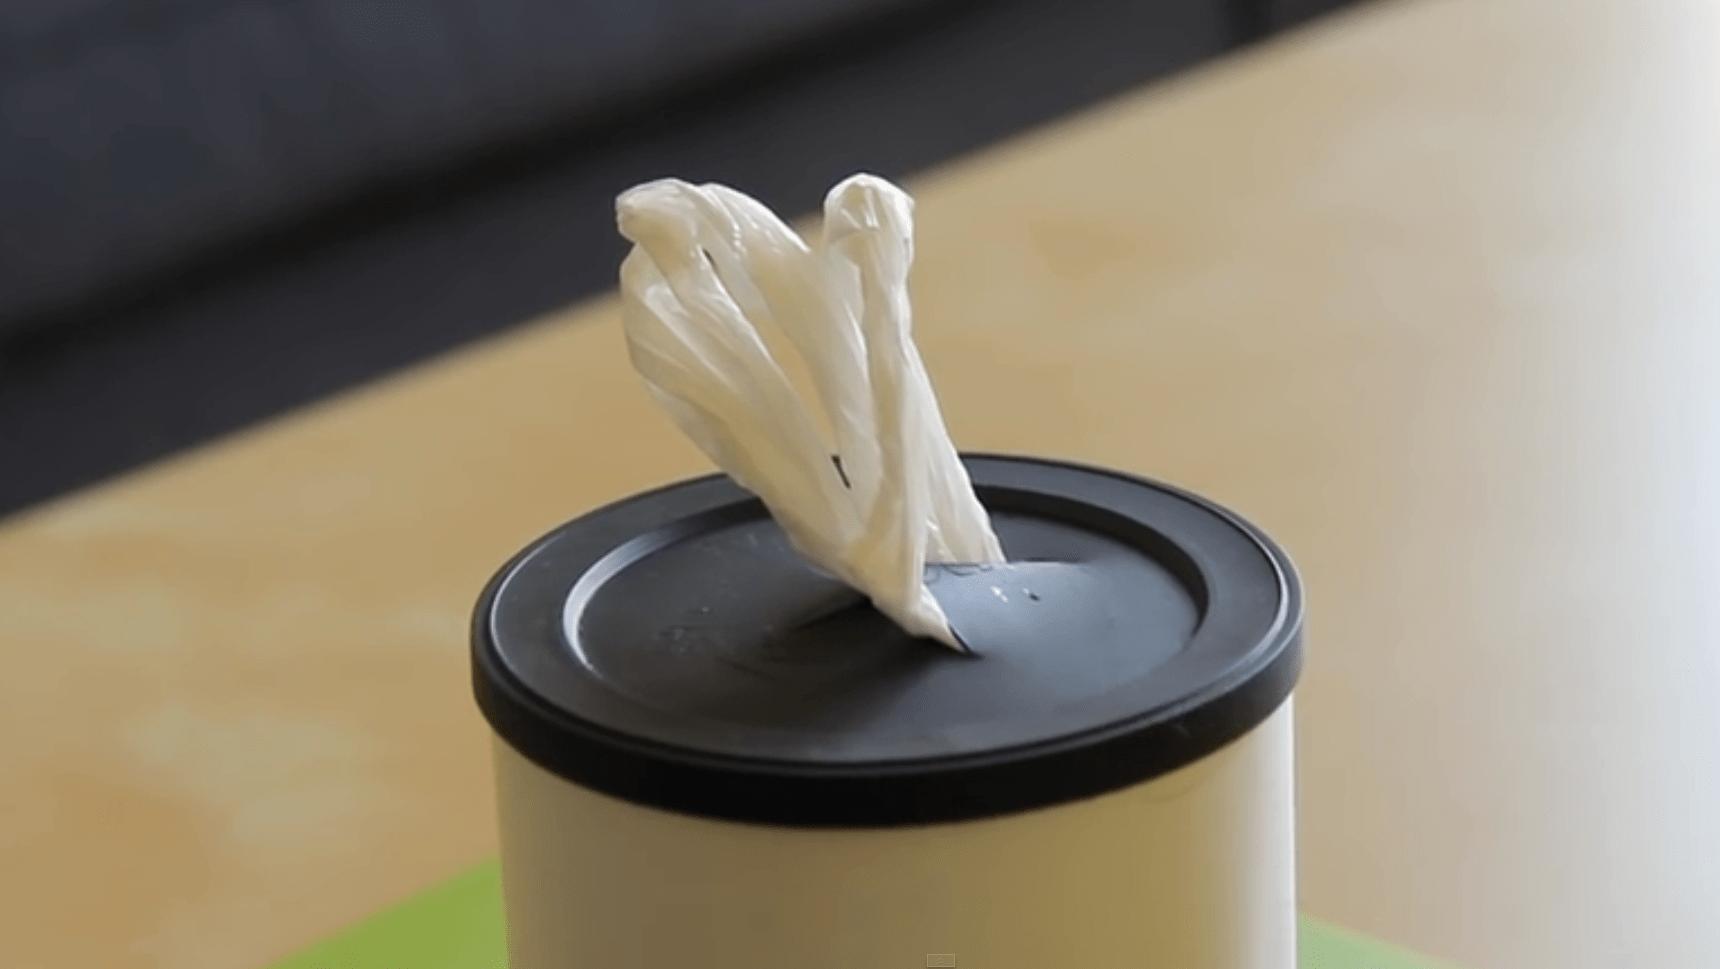 aprende 5 trucos para reciclar objetos que no deber as